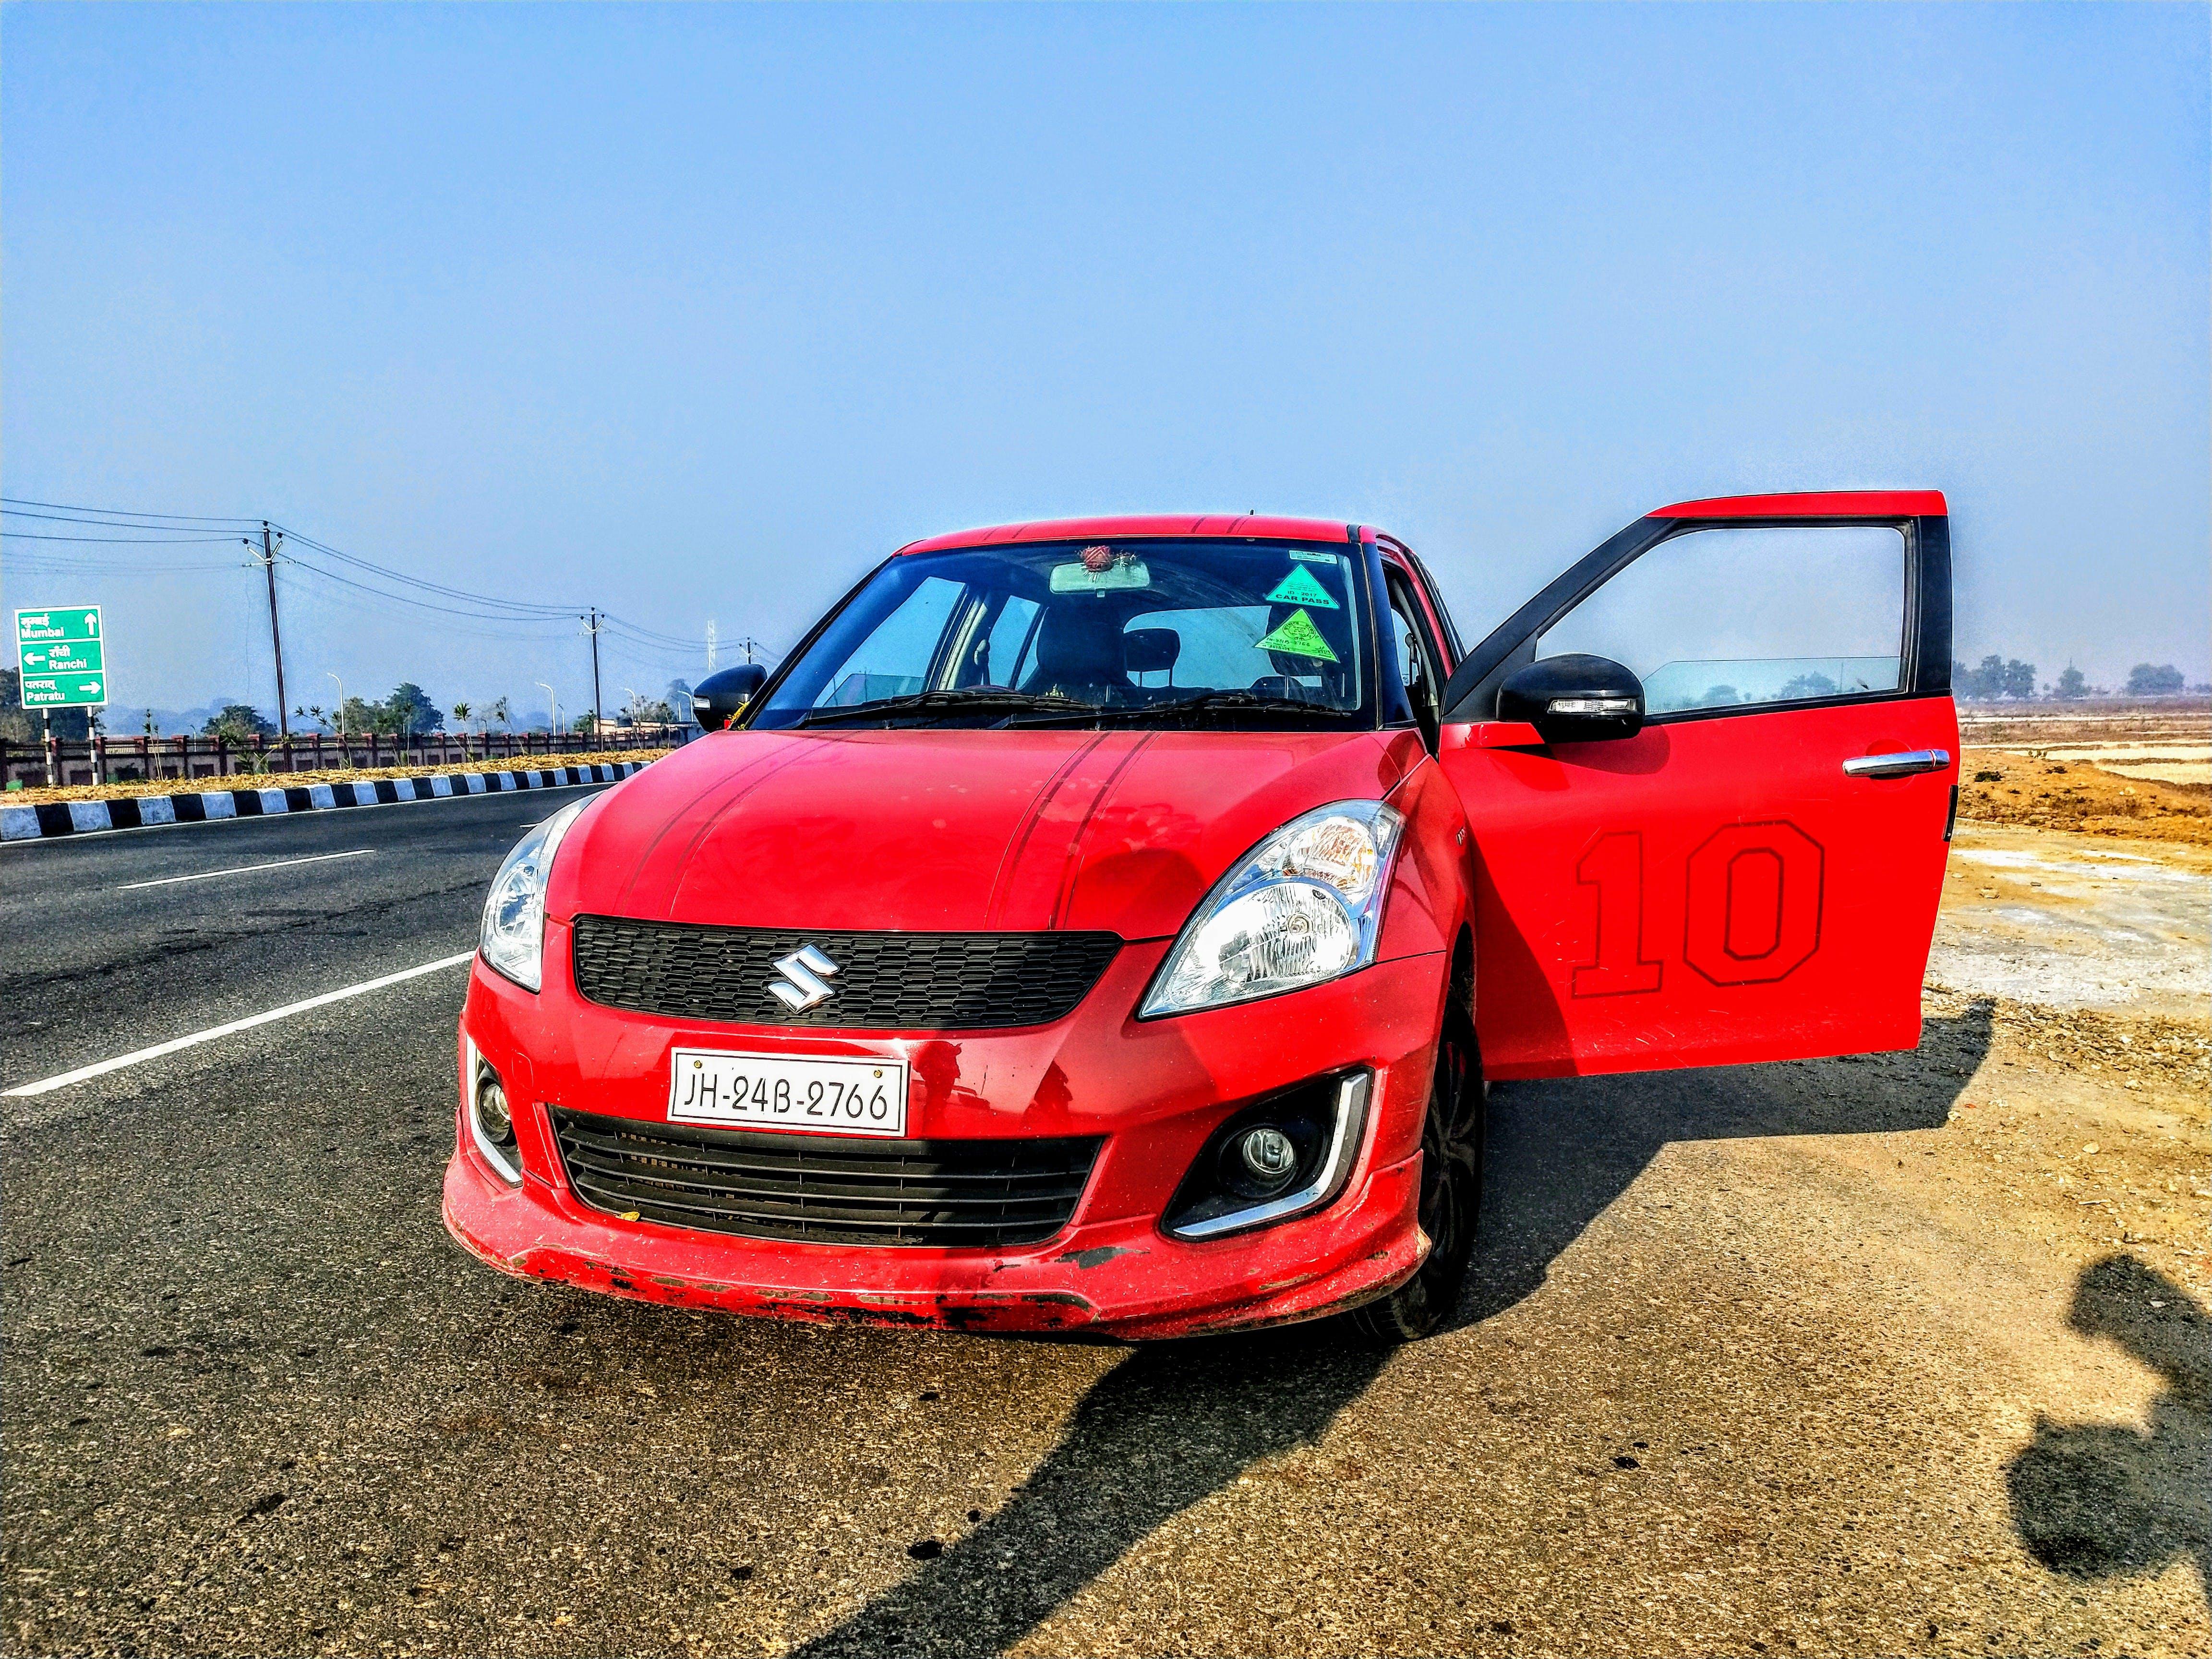 Free stock photo of Maruti Red car, swift